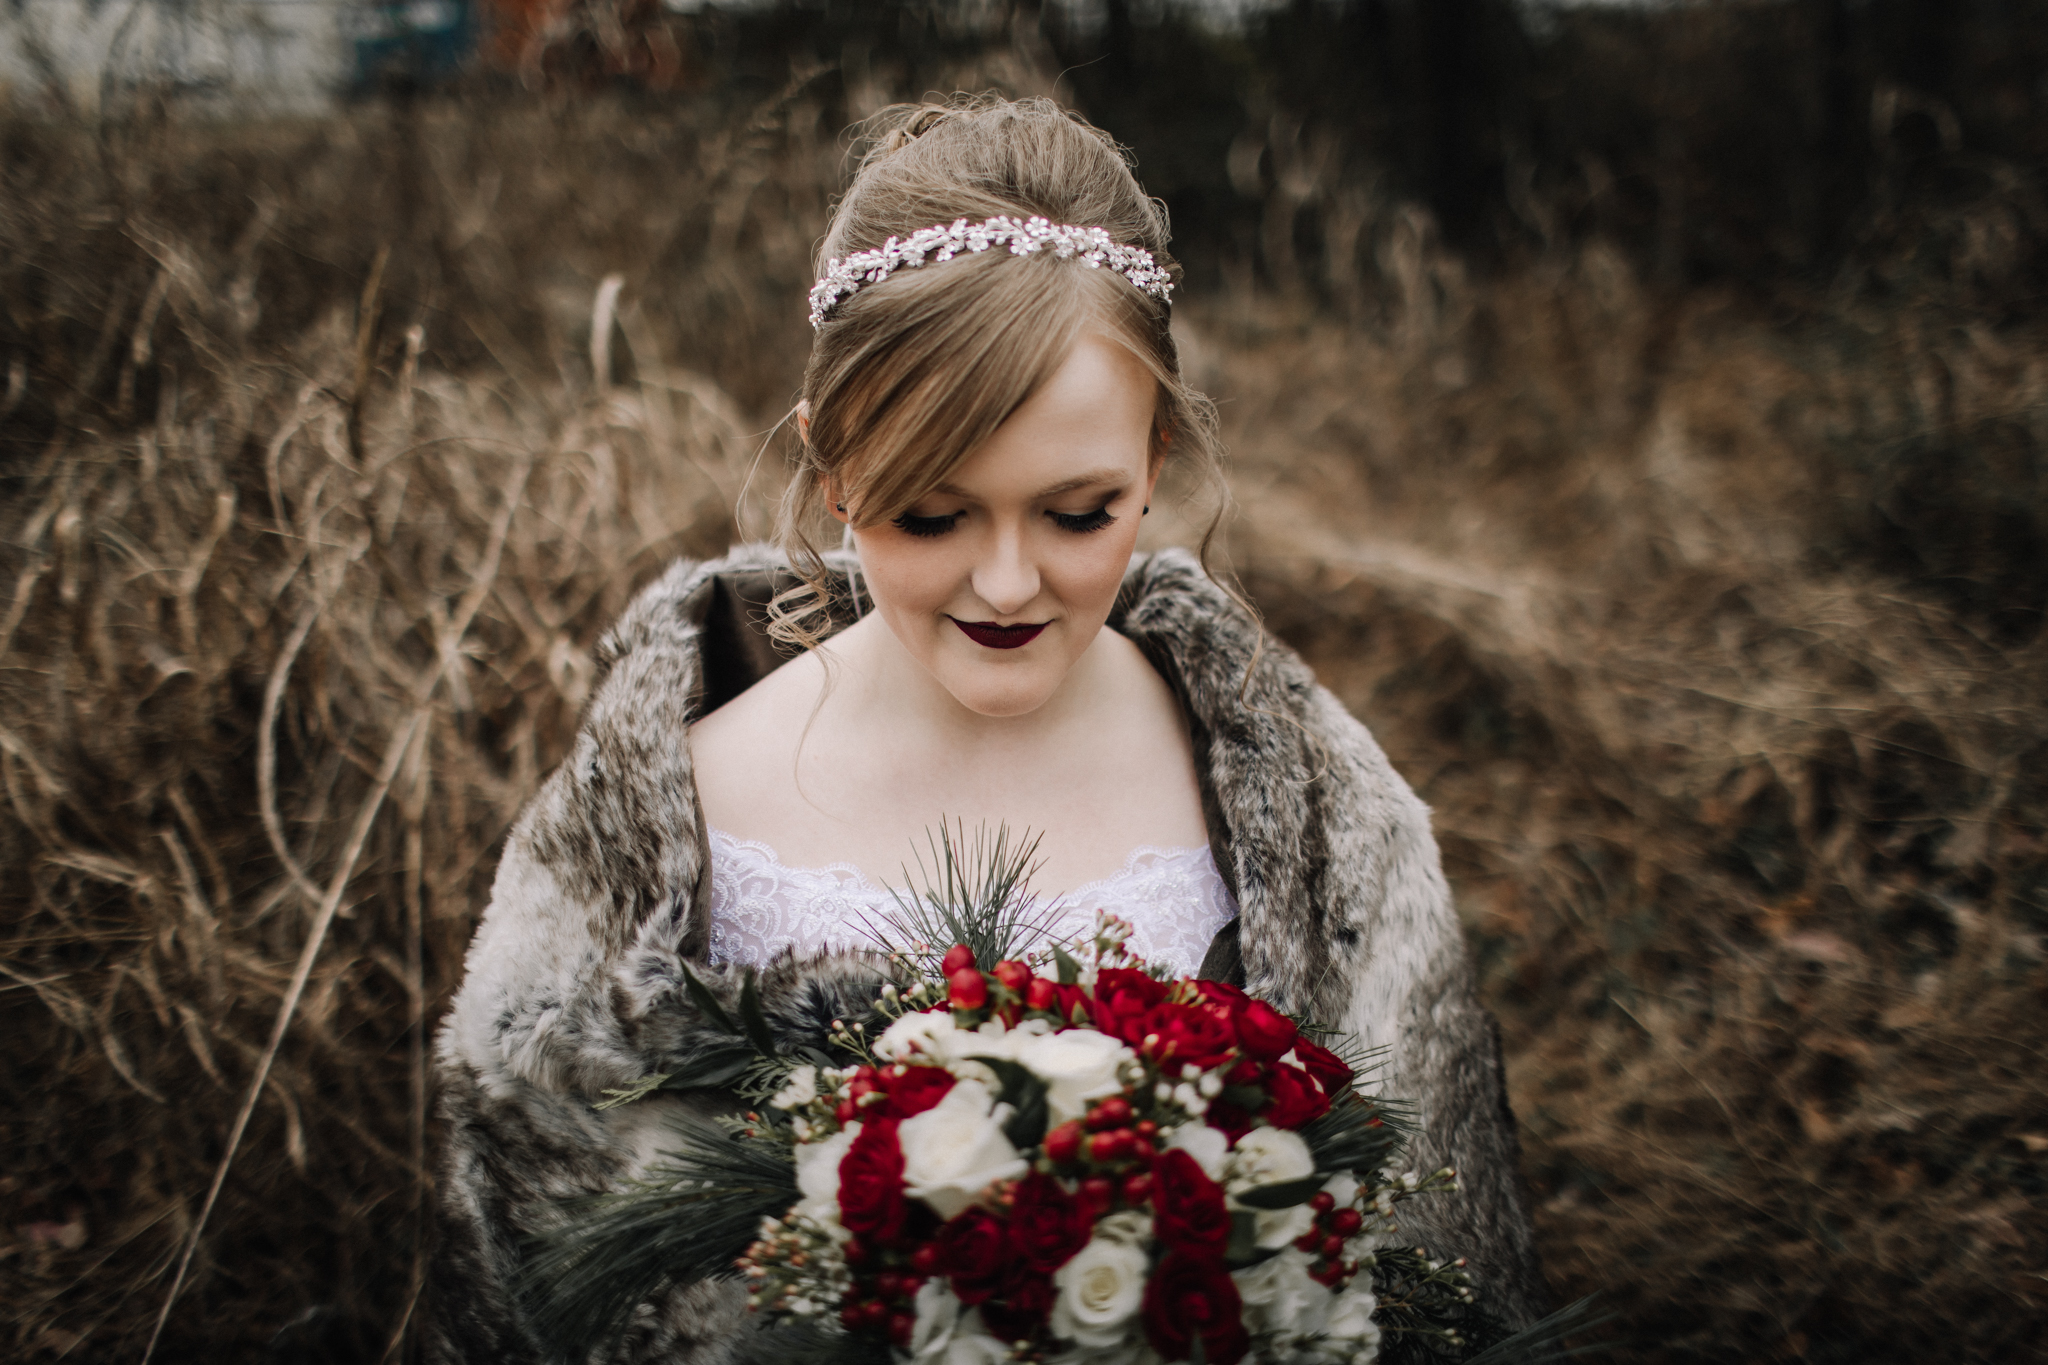 billie-shaye-style-photography-www.billieshayestyle.com-winter-wedding-the-belle-hollow-clarksville-tennessee-9043.jpg